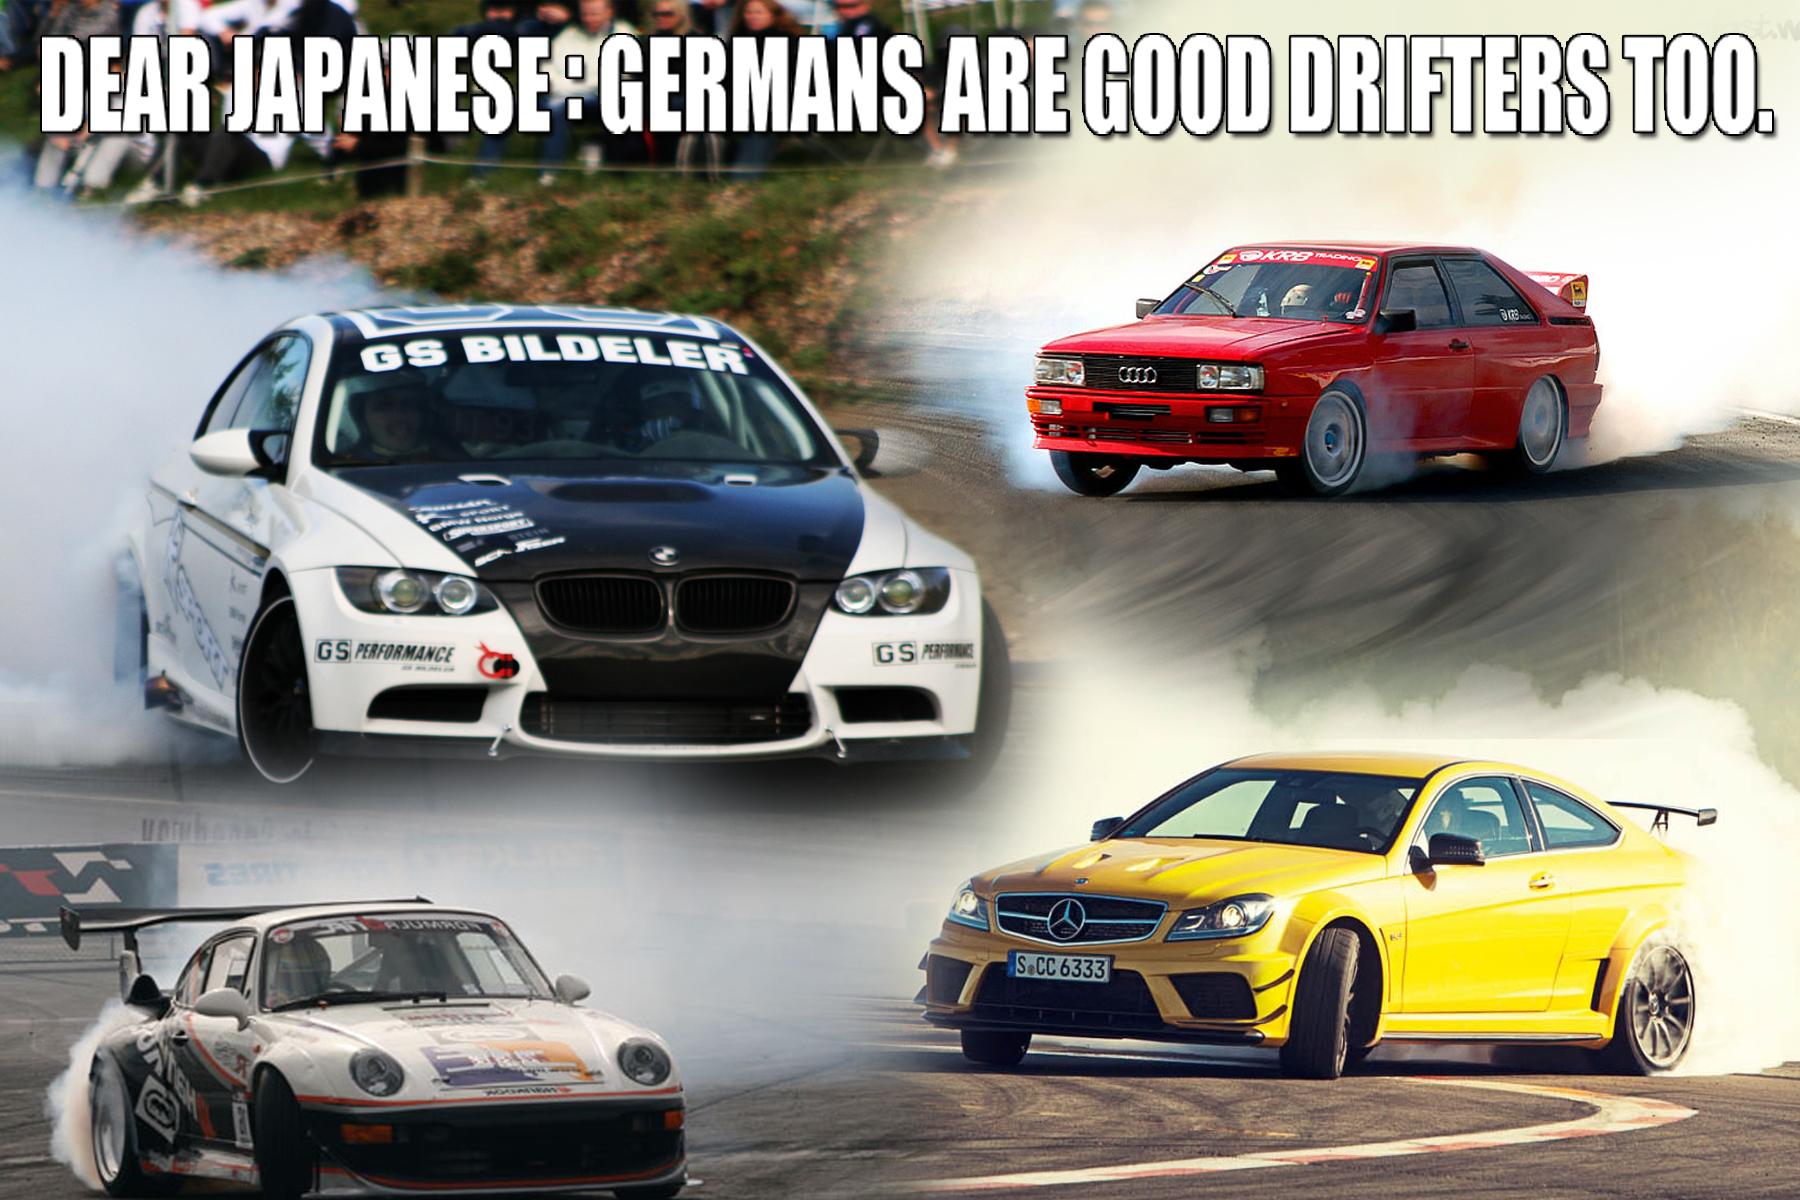 Germans Drift Better Than Japanese